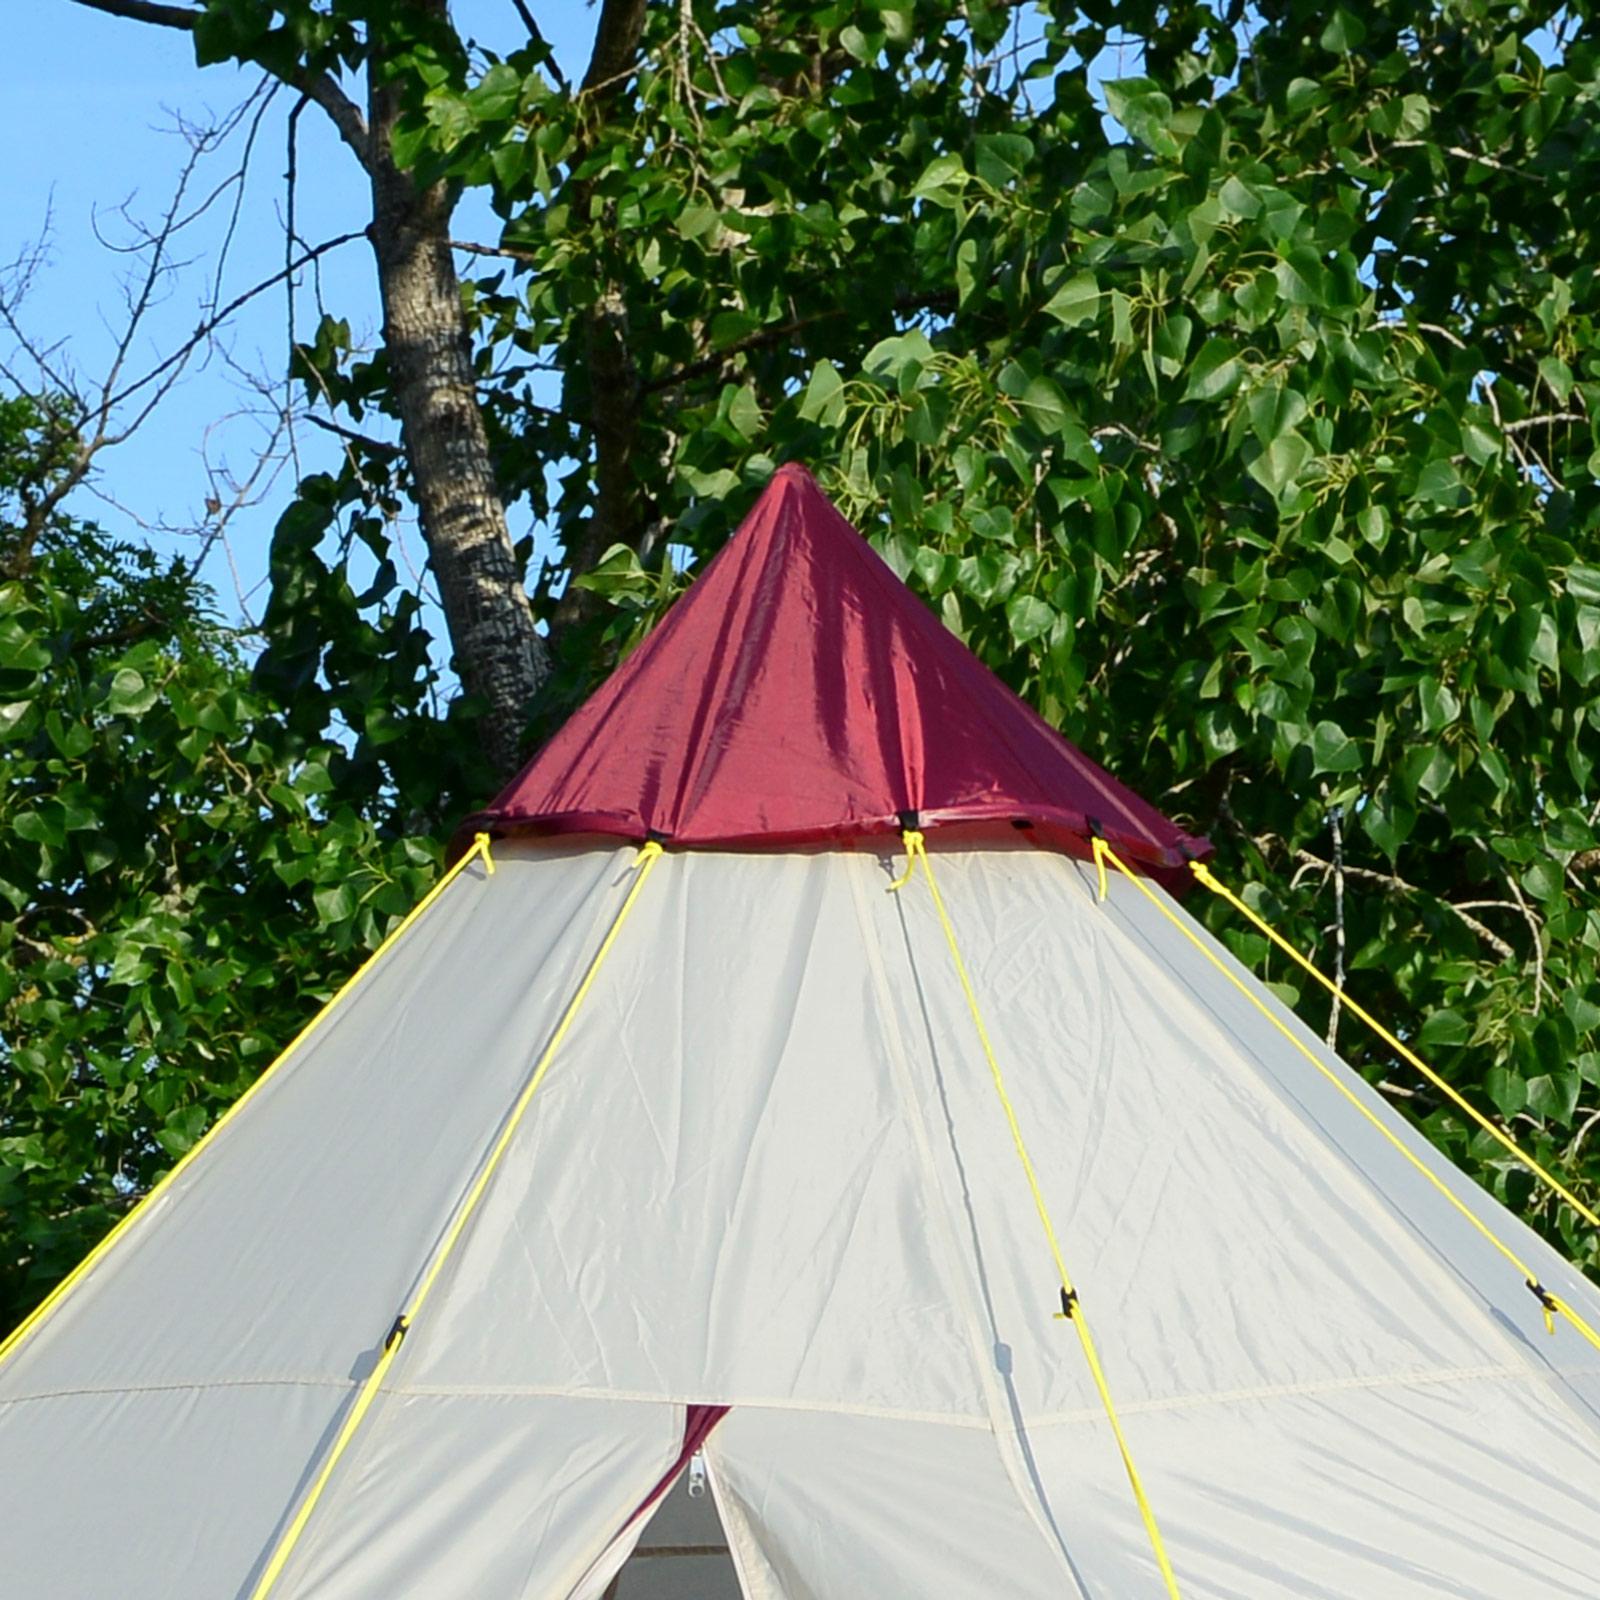 skandika-Teepee-250-Camping-Party-Festival-Tent-2-5-M-Height-3000mm-Column-New thumbnail 7